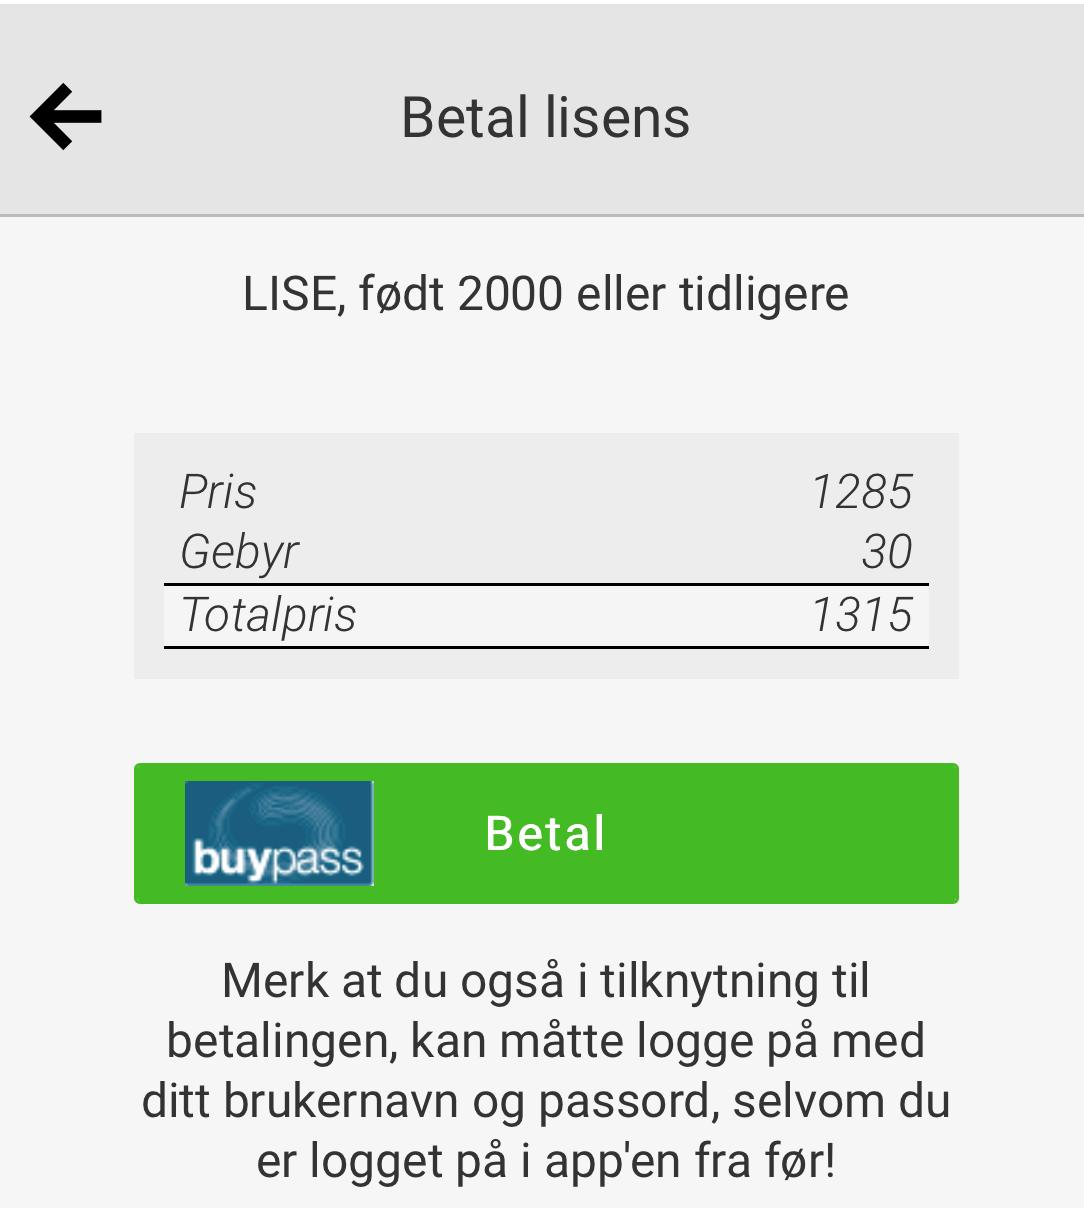 Lisens_Betal.PNG